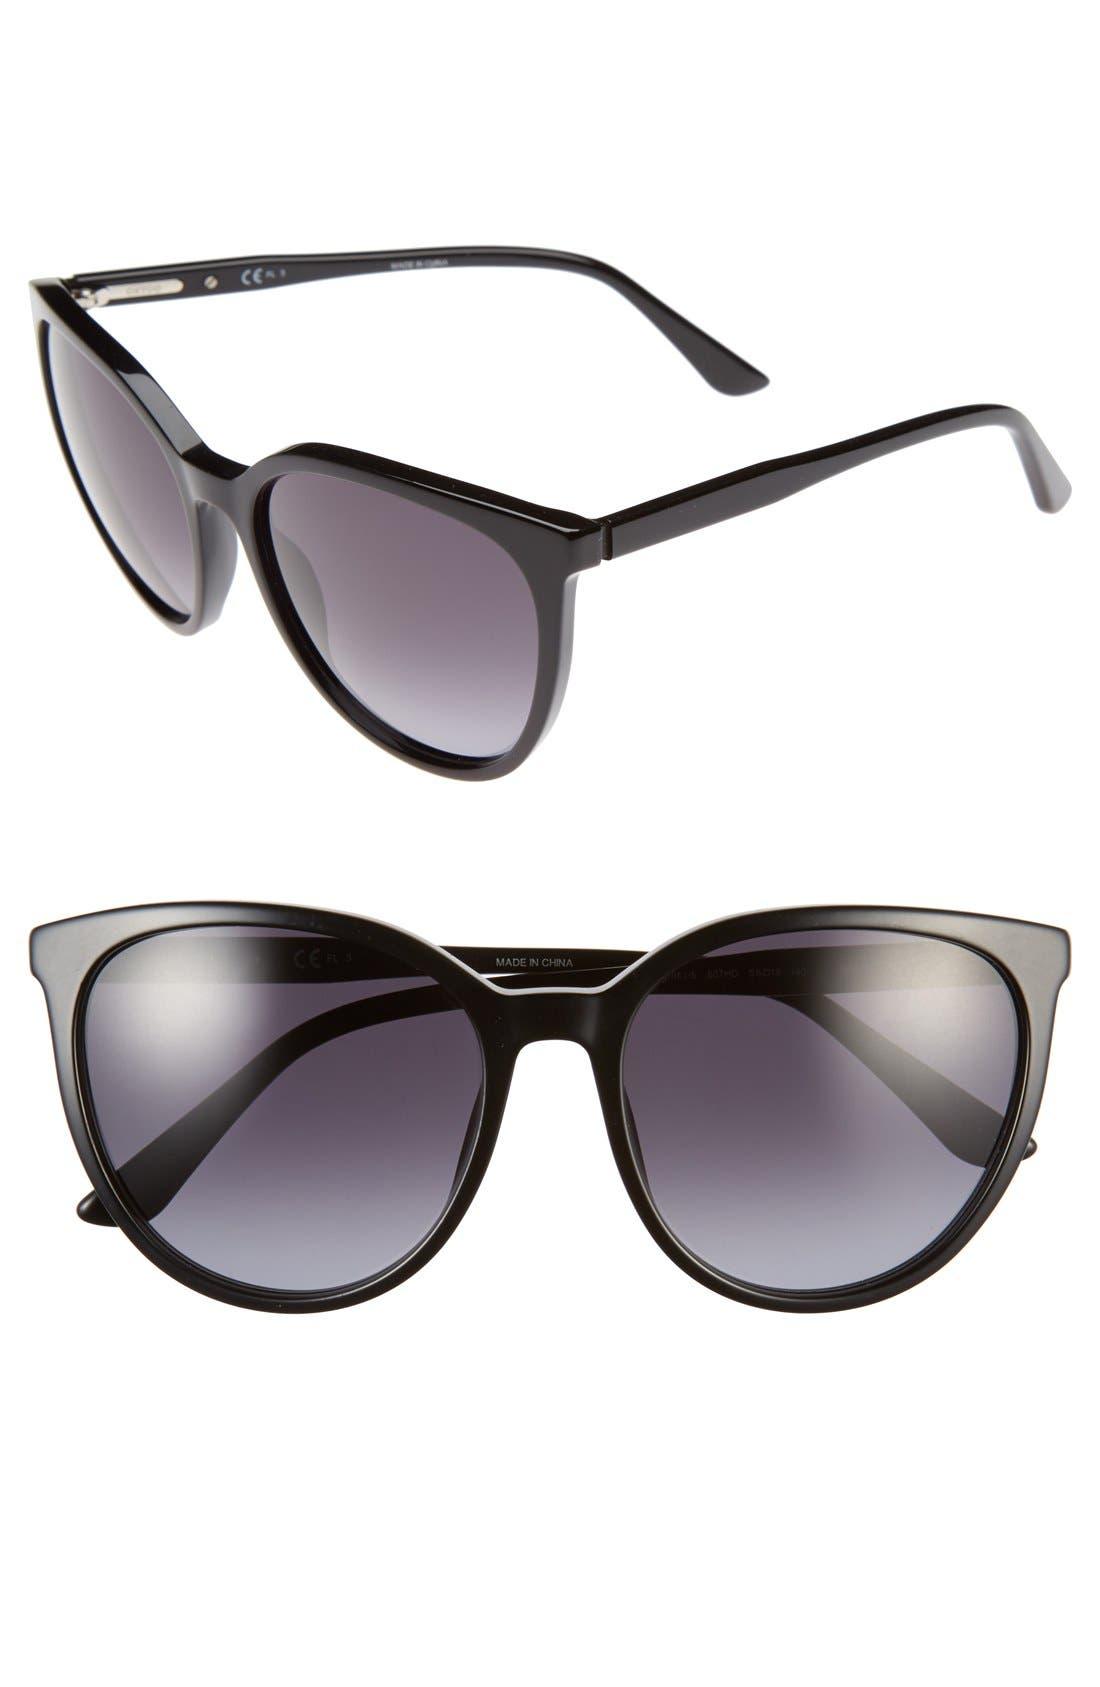 Main Image - Oxydo 56mm Retro Sunglasses